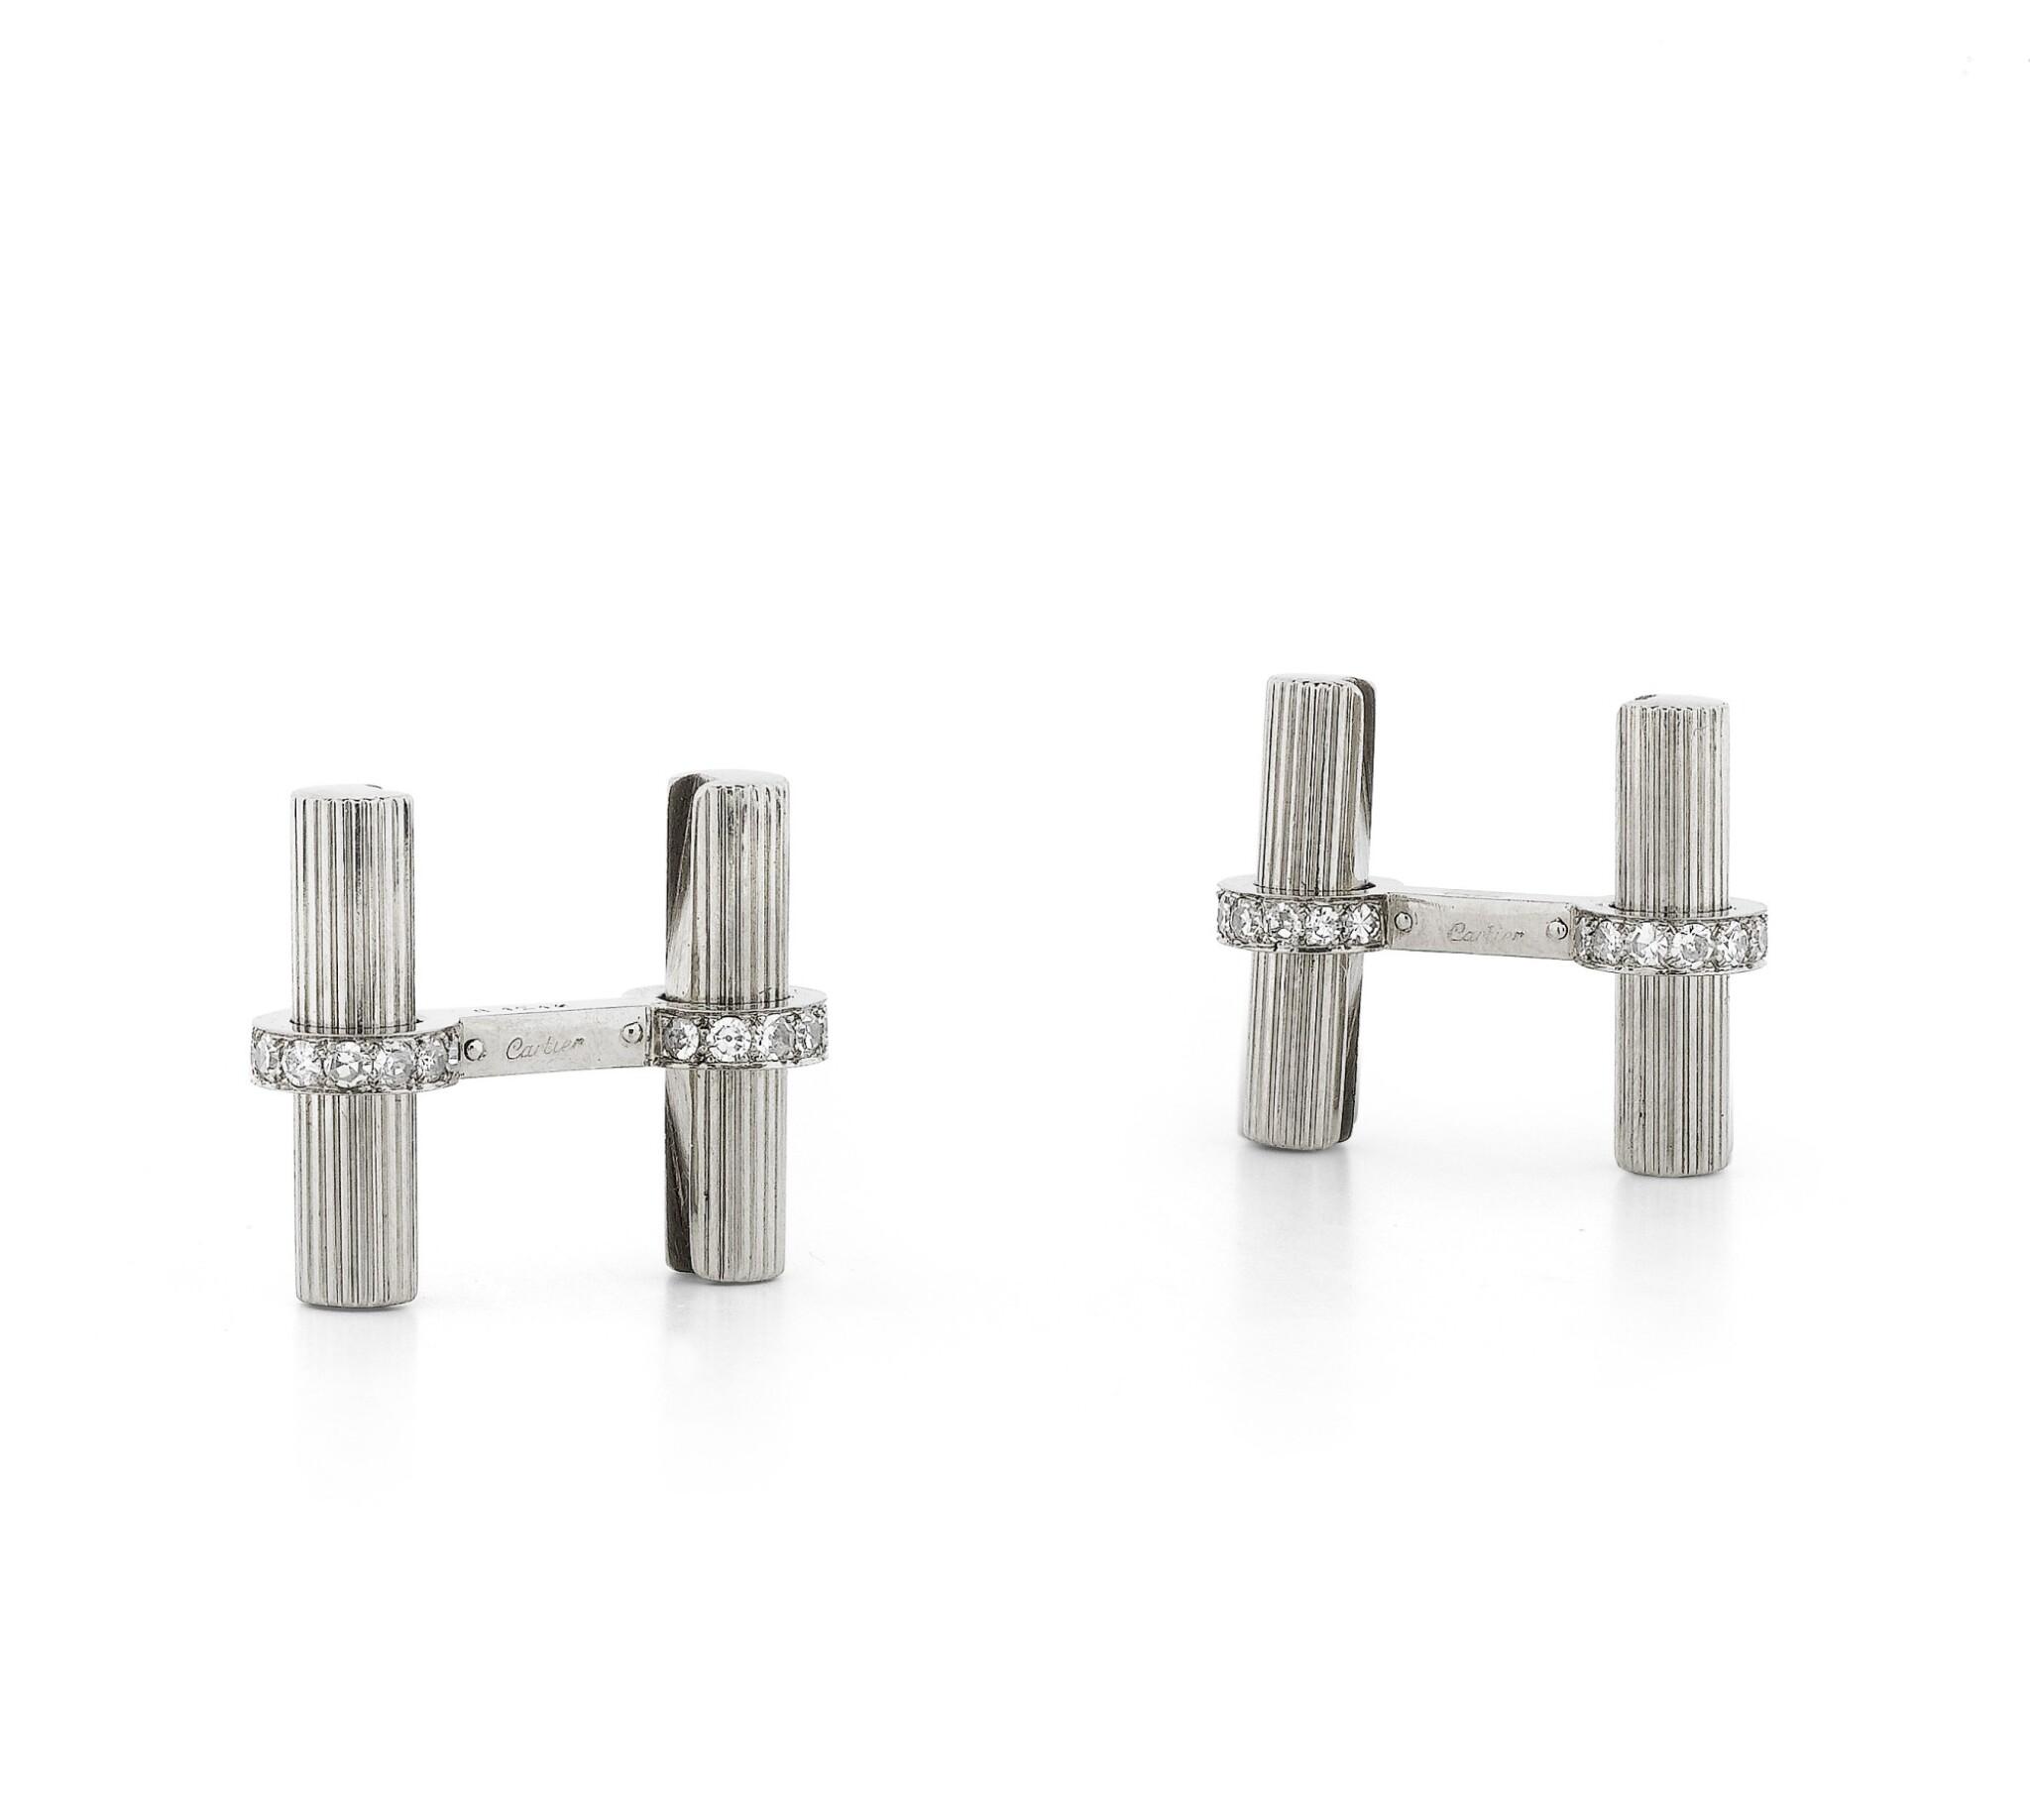 View full screen - View 1 of Lot 96. Paire de boutons de manchette diamants | Pair of diamond cufflinks.